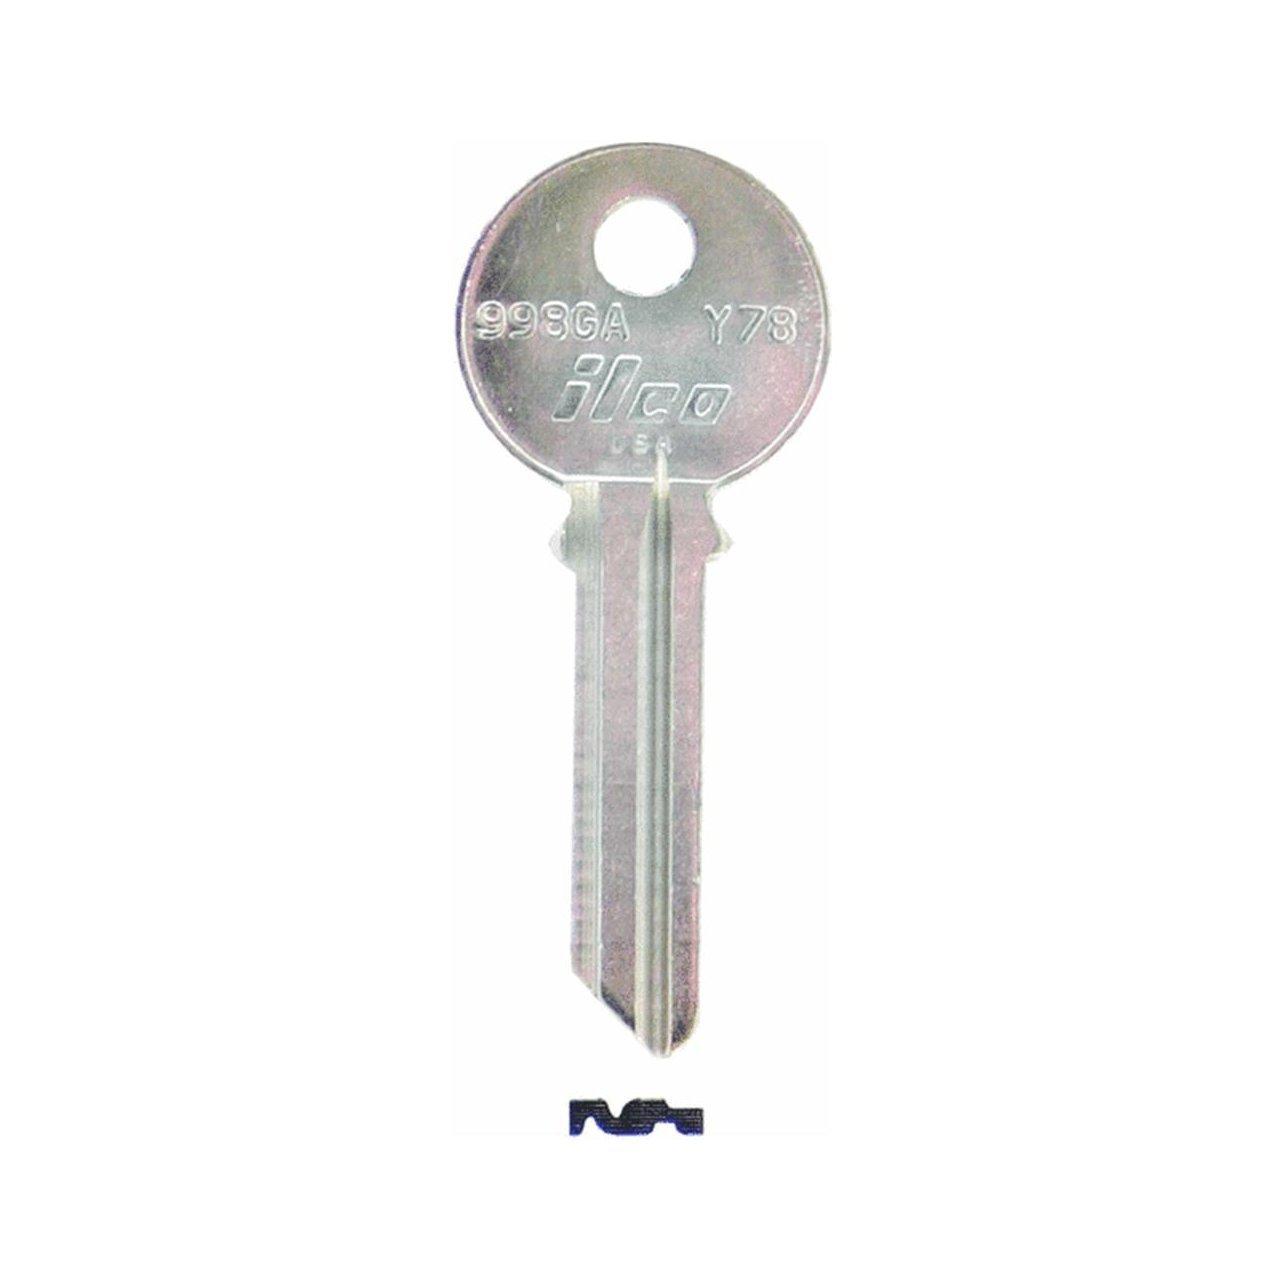 Cheap Ilco Blank Keys, find Ilco Blank Keys deals on line at